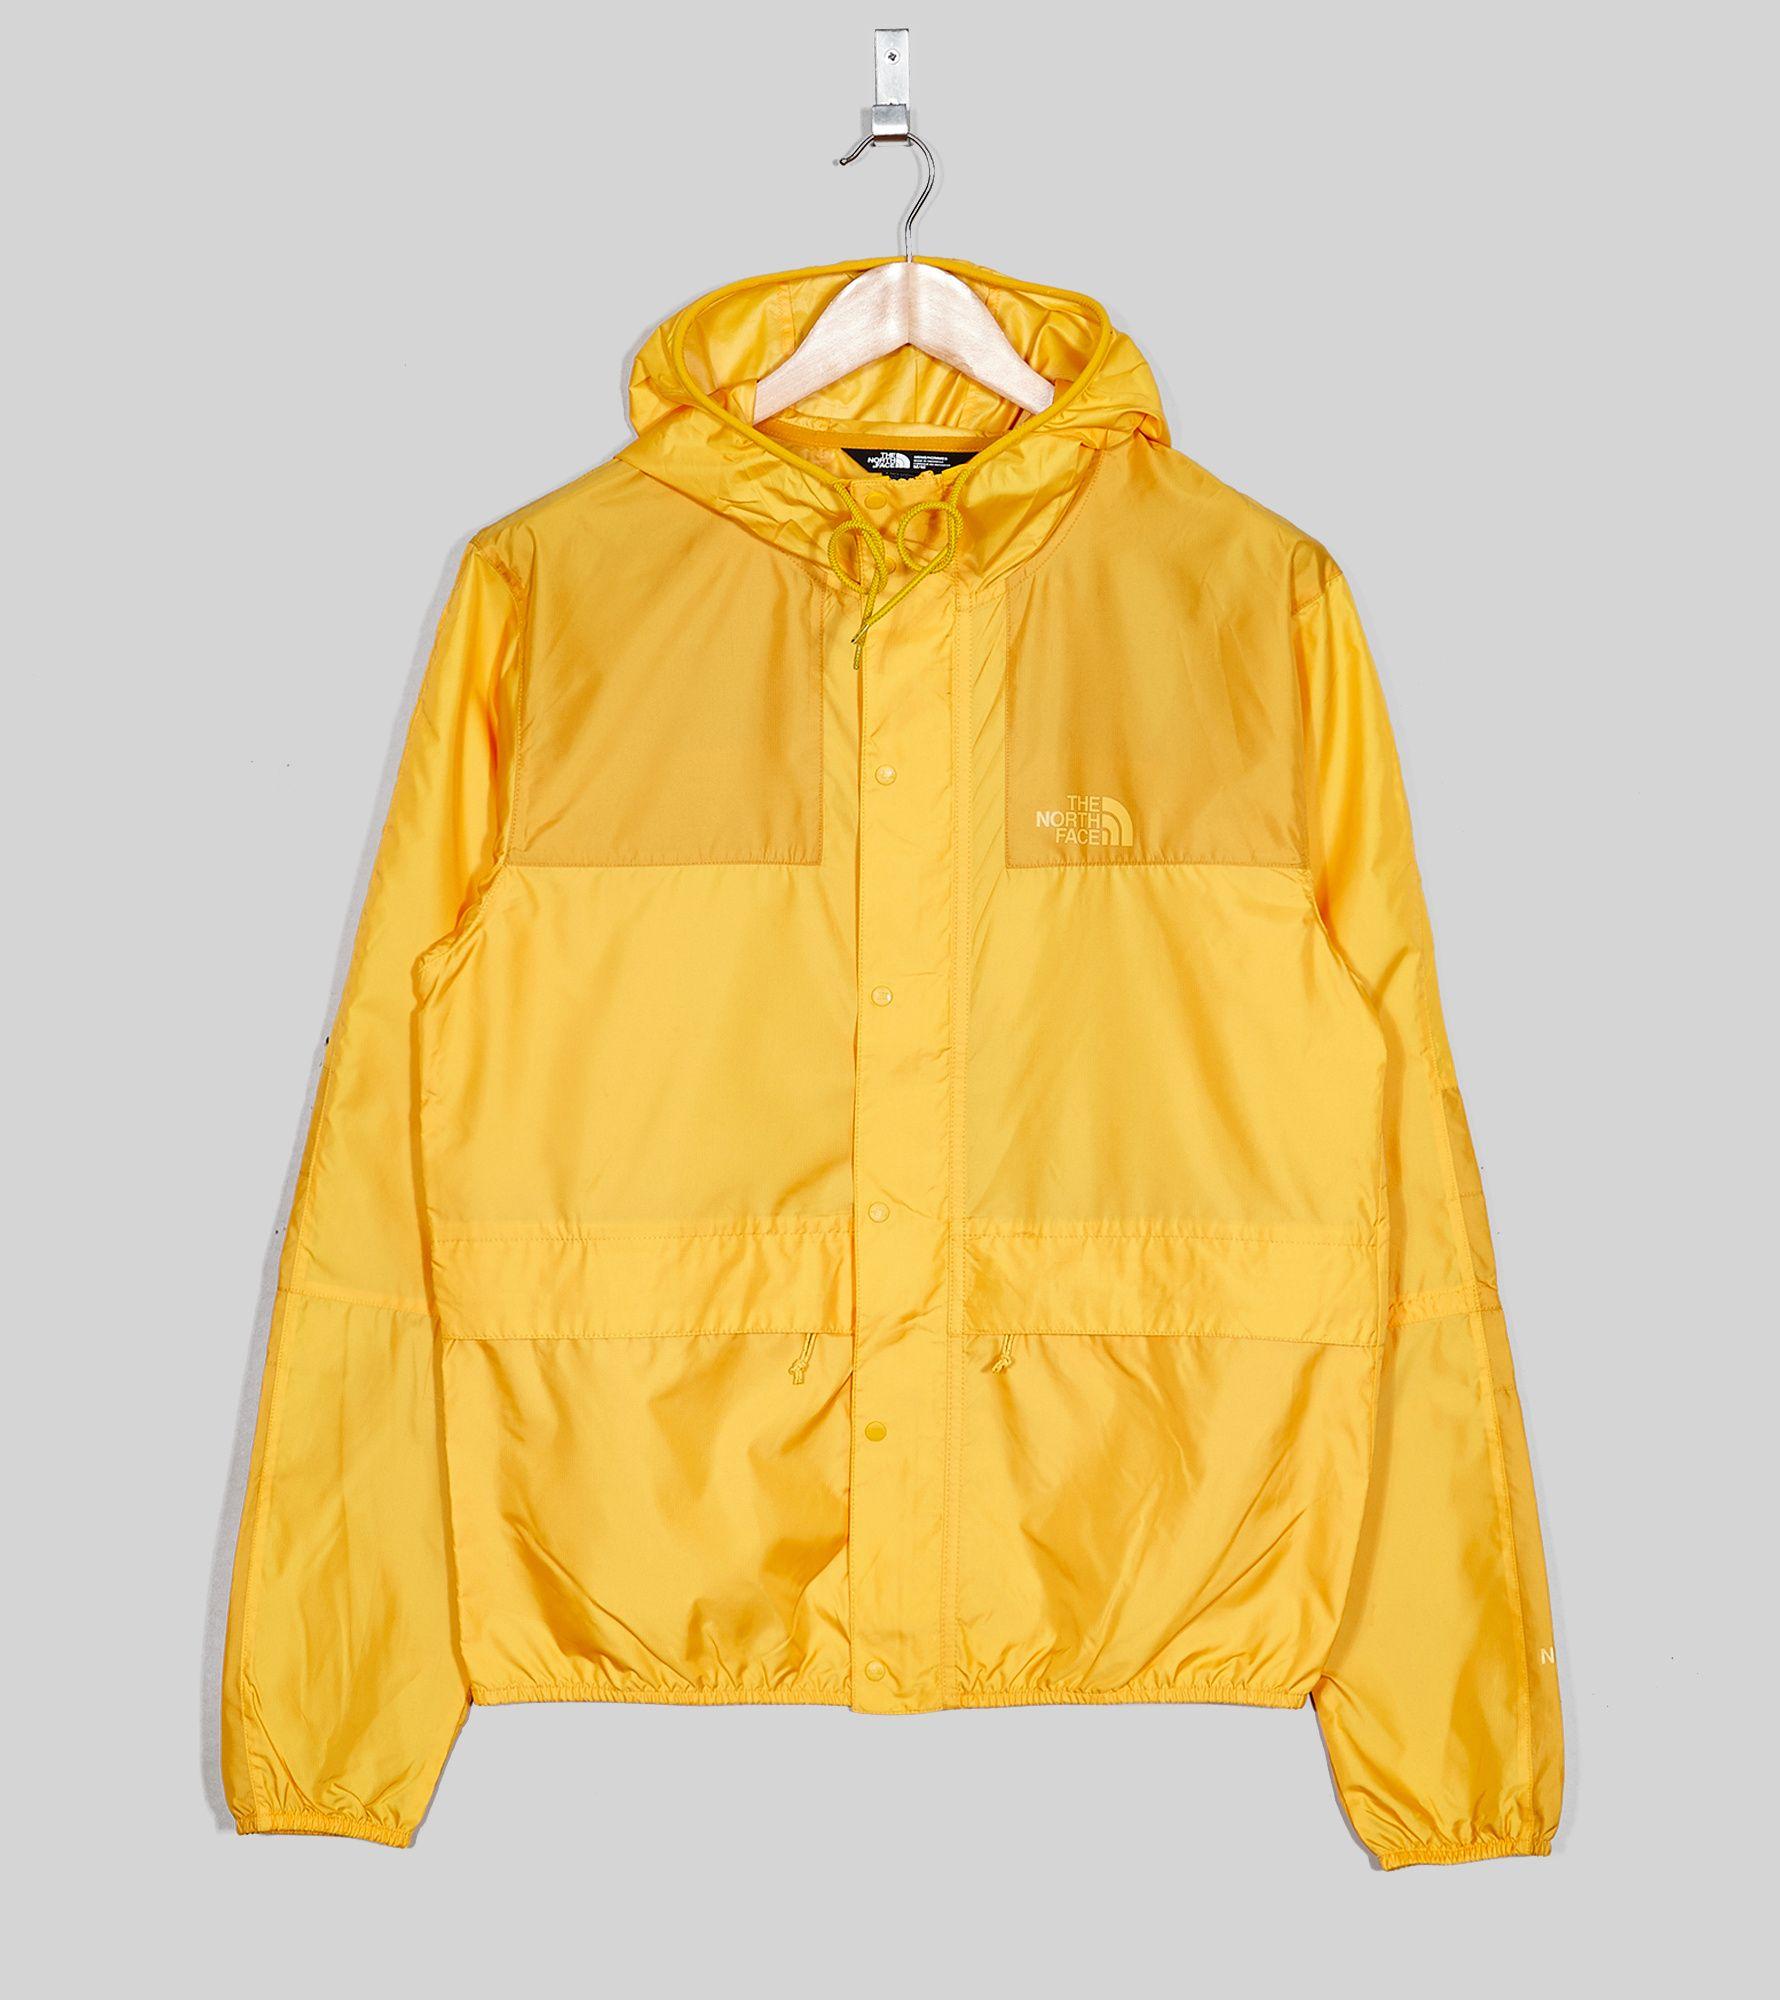 The North Face 1985 Seasonal Mountain Jacket